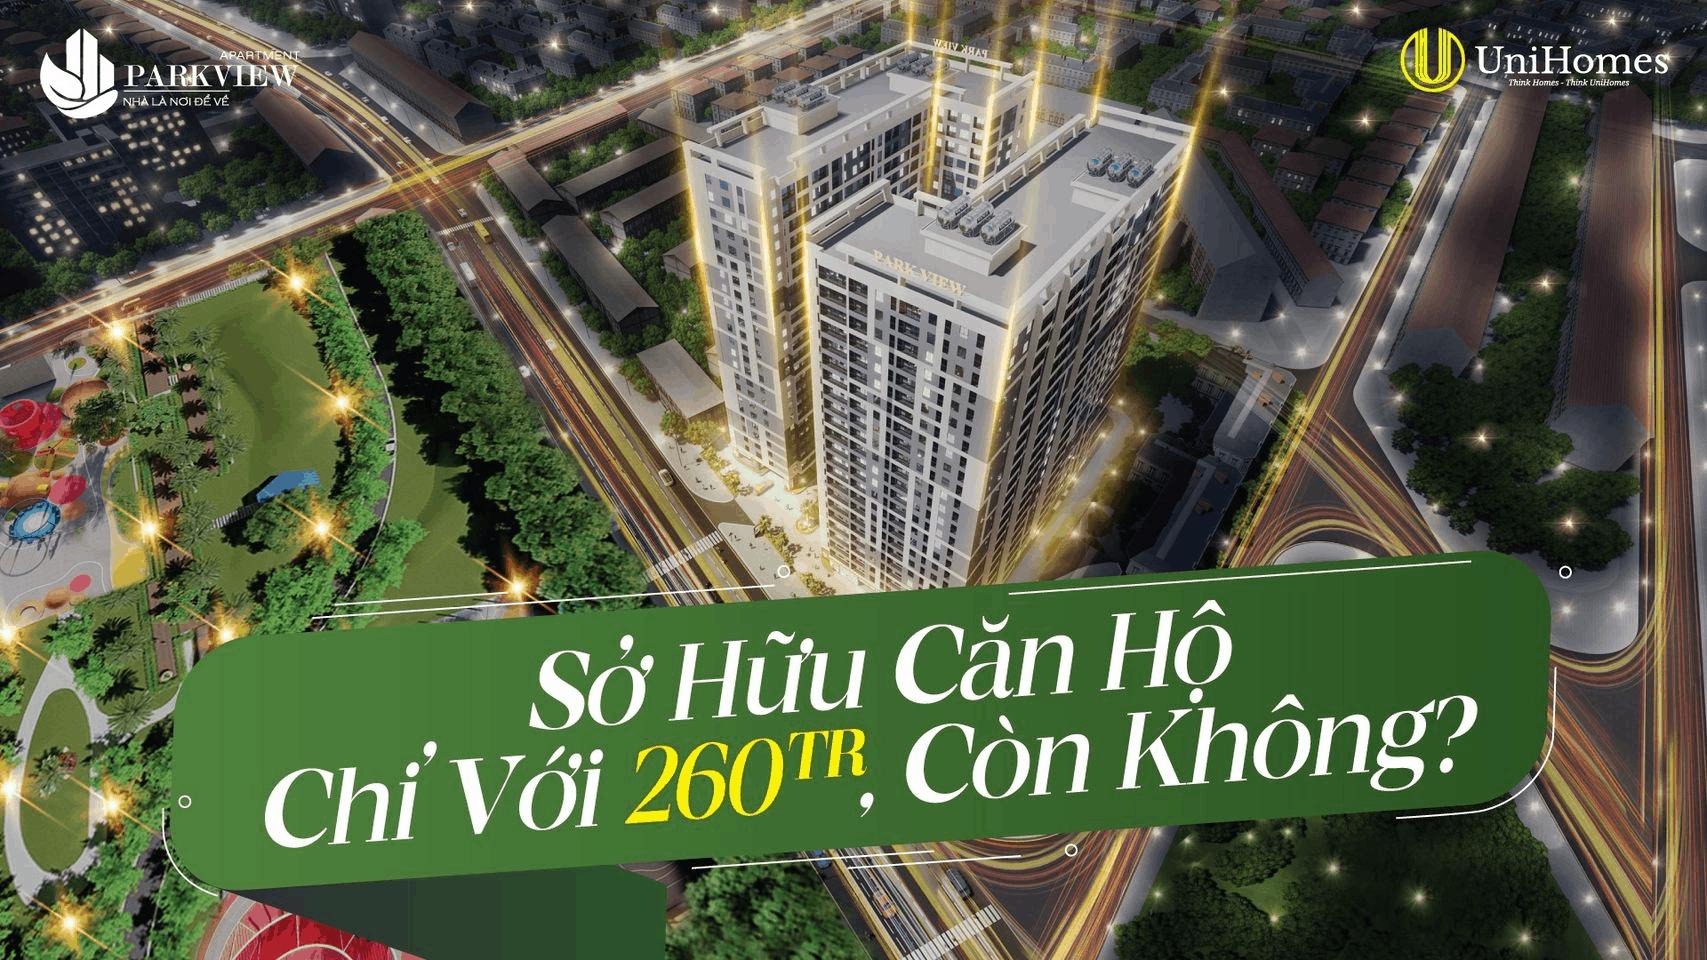 So sánh Parkview Apartment với Anderson Park (Lavita Thuận An) image 2021 05 24 213054 17